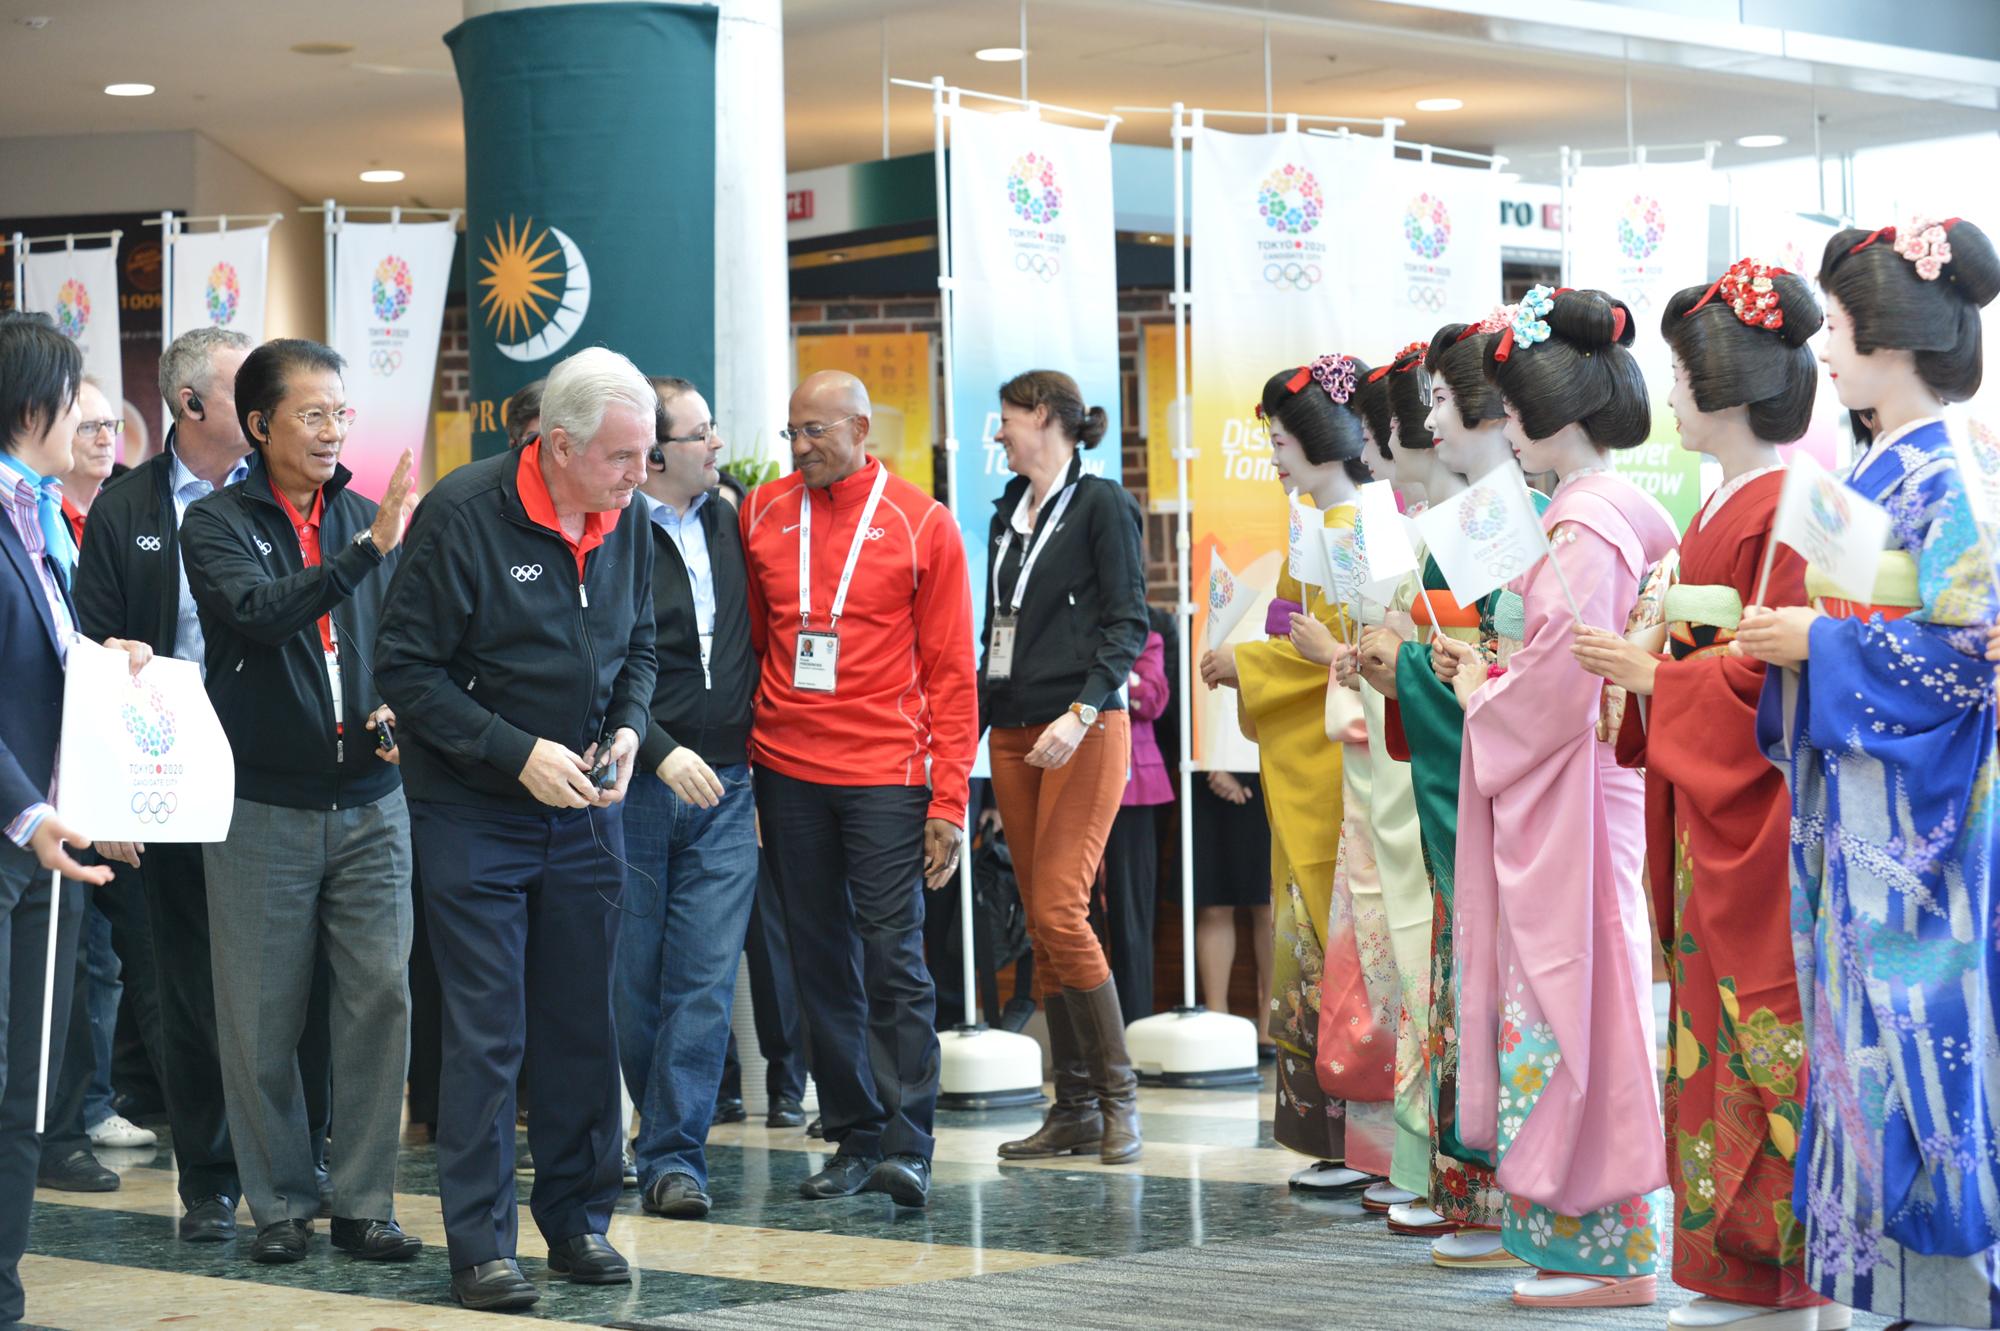 Sir Craig Reedie bowing at Tokyo Big Sight March 6 2013